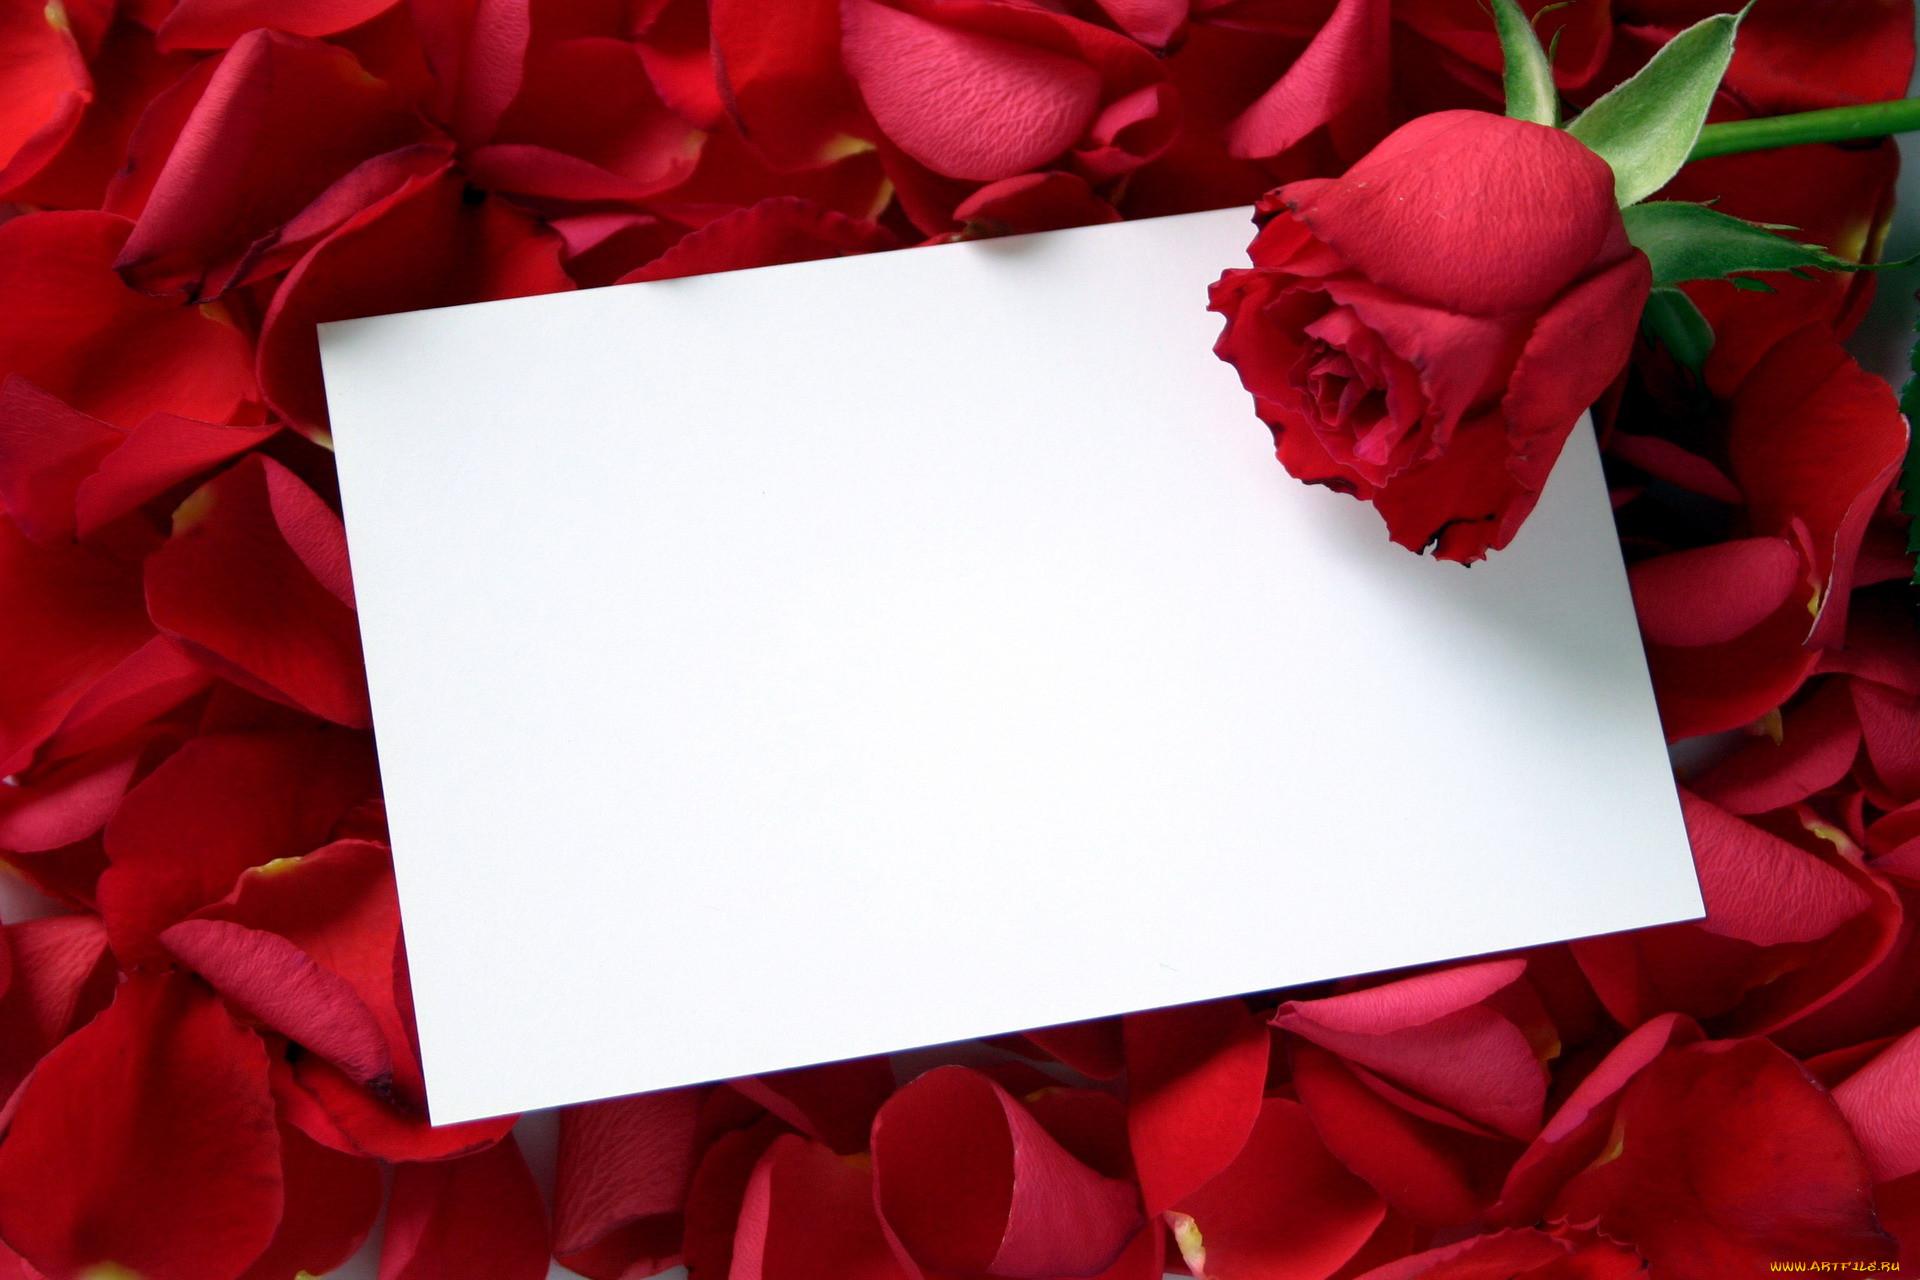 скромно, картинки о любви имени танзиля время остановку